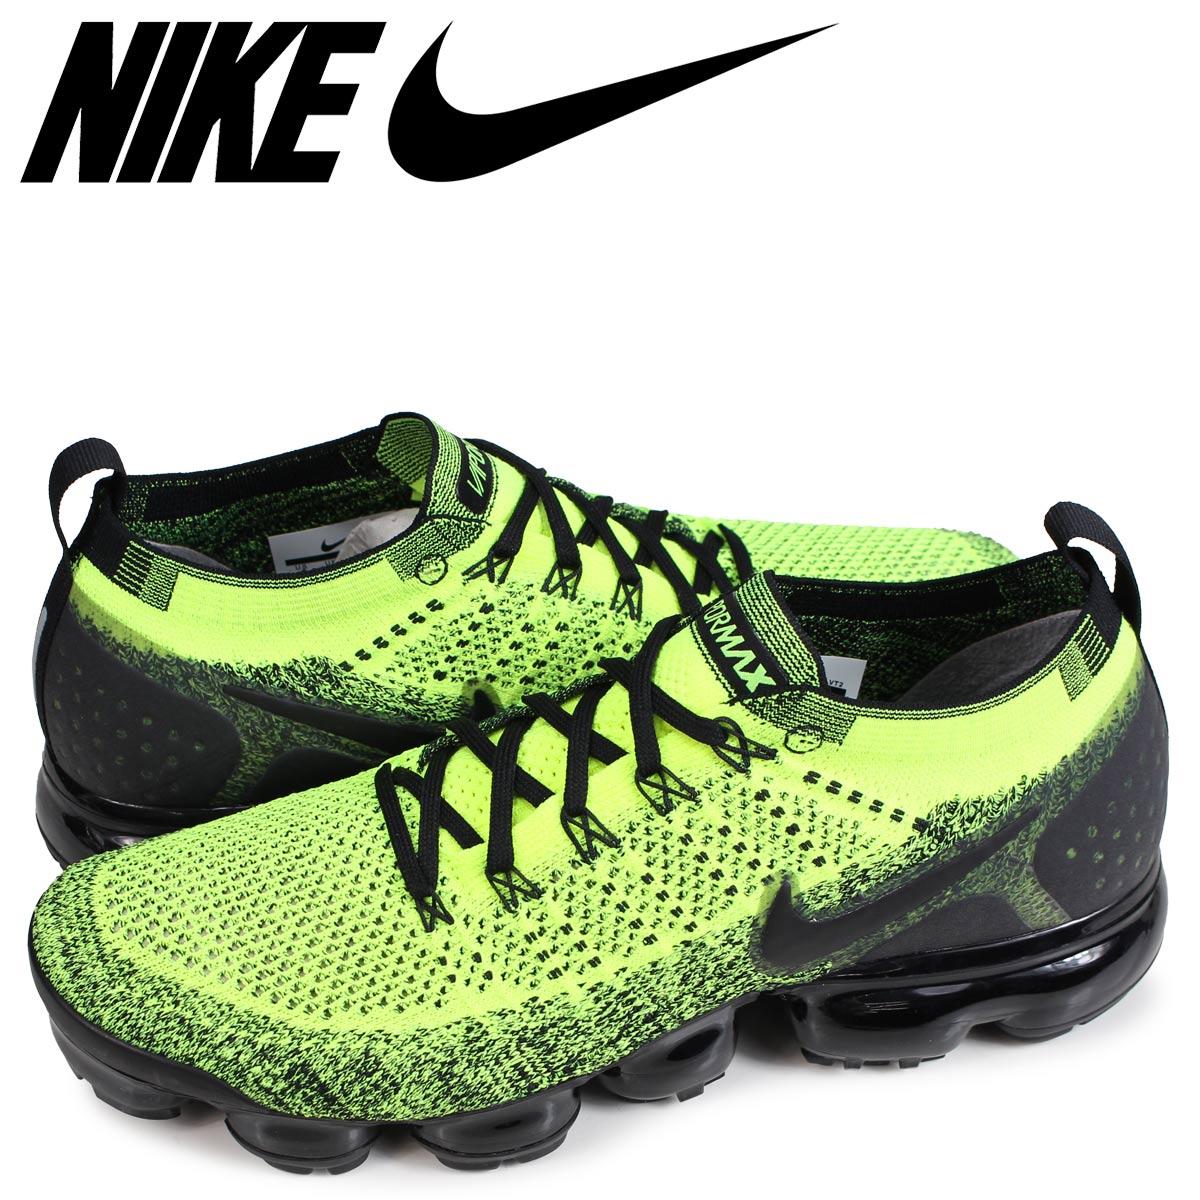 wholesale dealer de36b 94d94 NIKE AIR VAPORMAX FLYKNIT 2 Nike air vapor max fried food knit 2 sneakers  men neon yellow 942,842-701